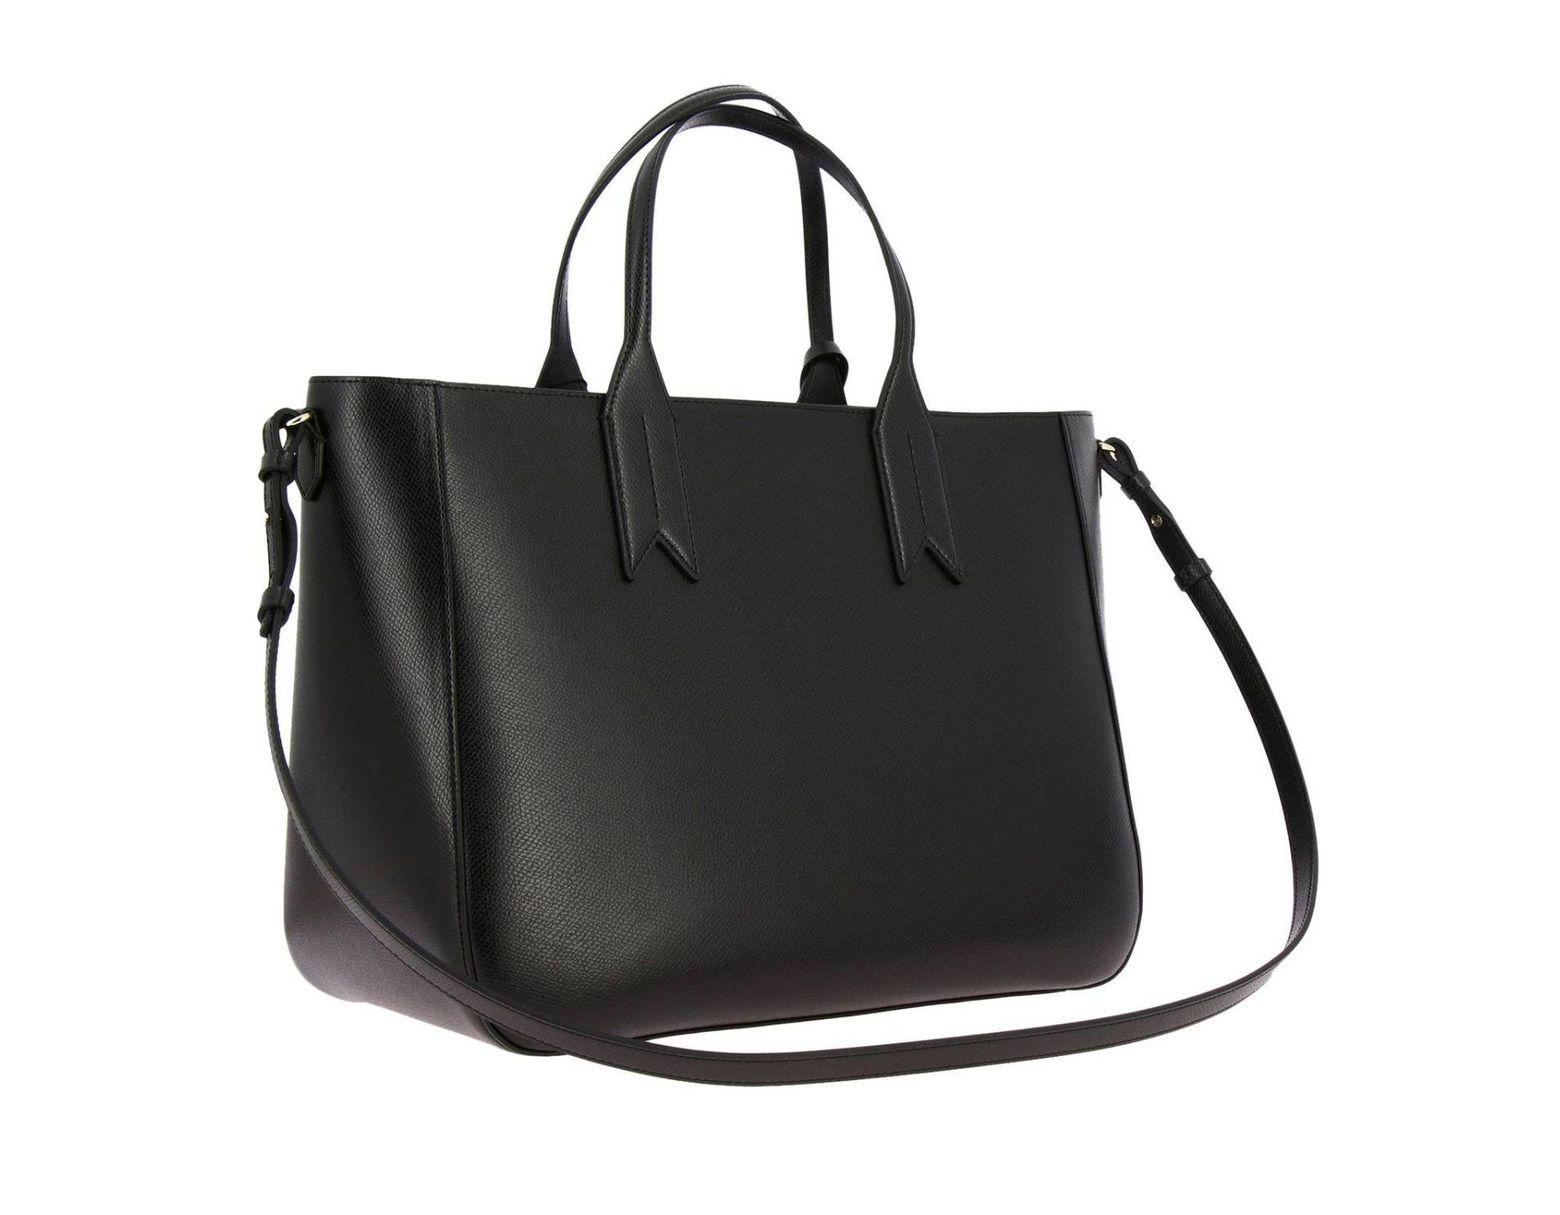 9b7ee52888 Black Women's Handbag